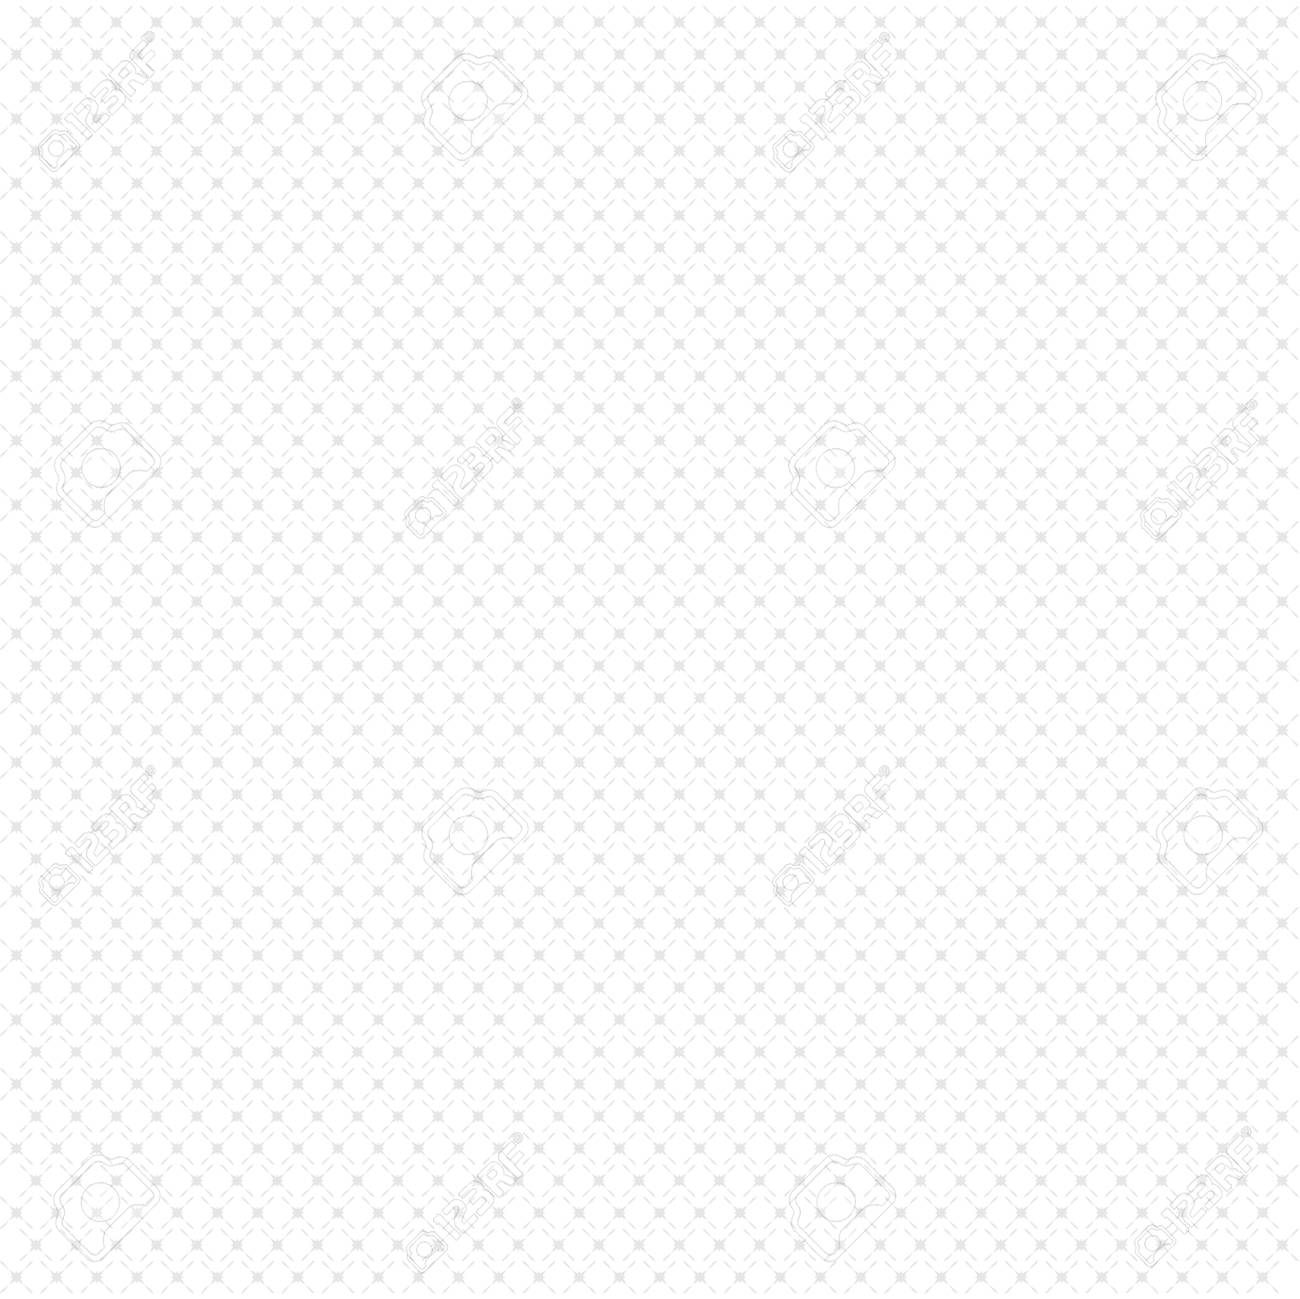 Illustration of a white background pattern. - 97016359